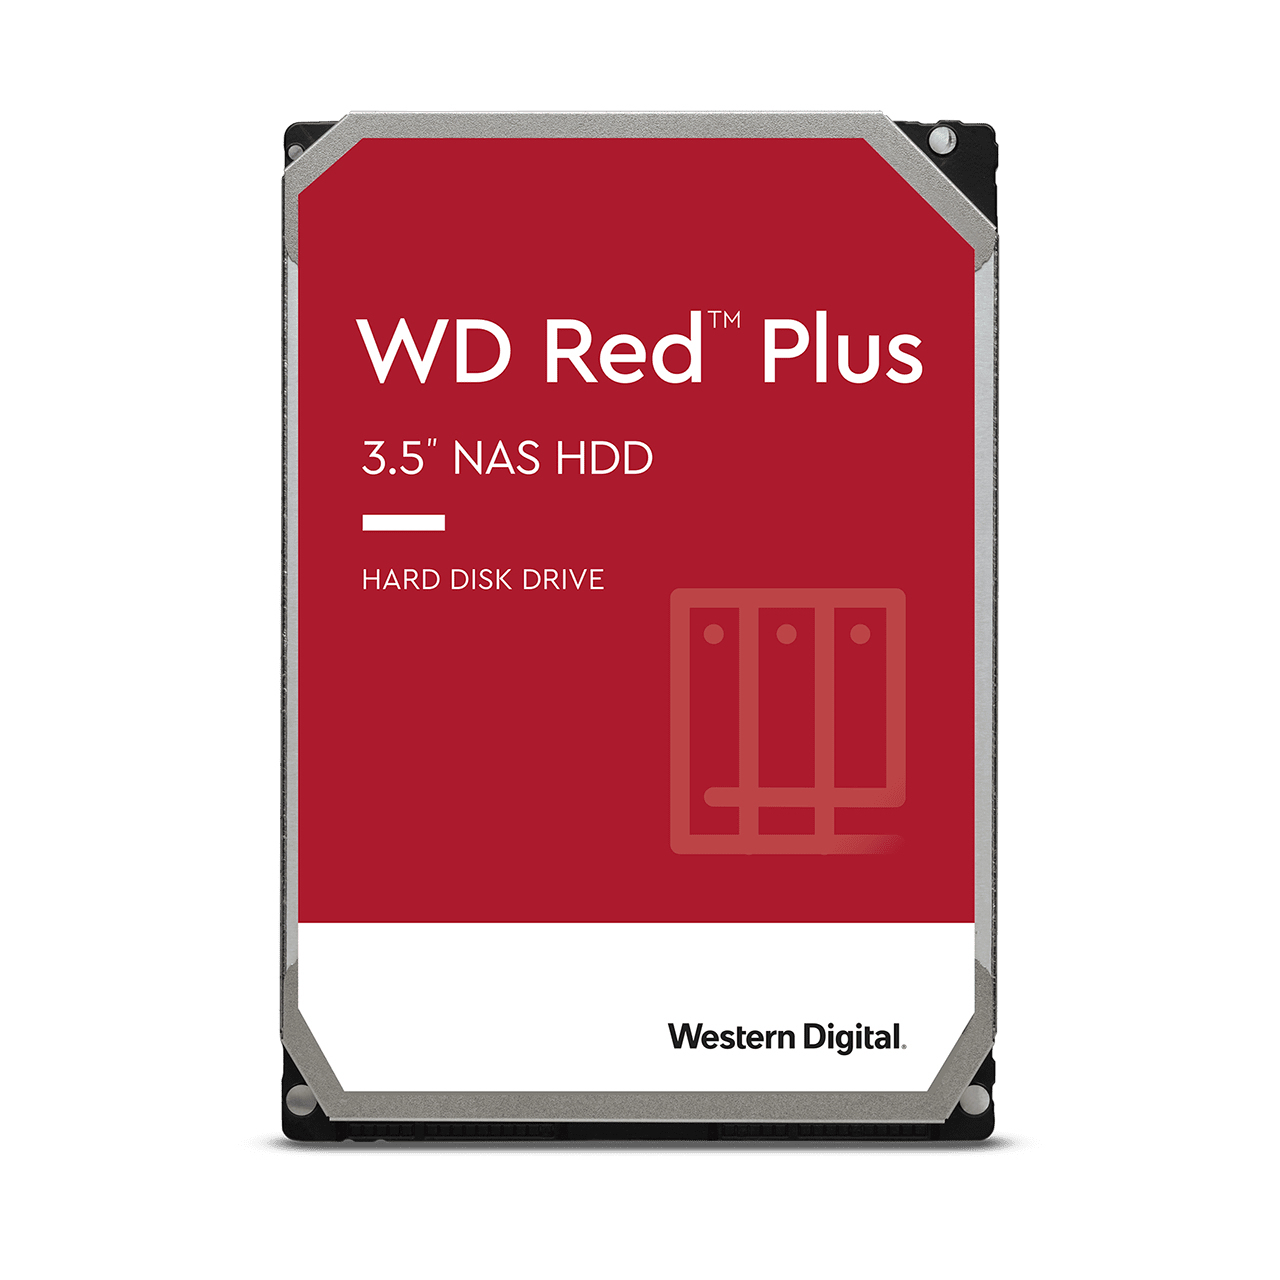 Wd Red Plus 3.5 6000 Gb Serial Ata Iii